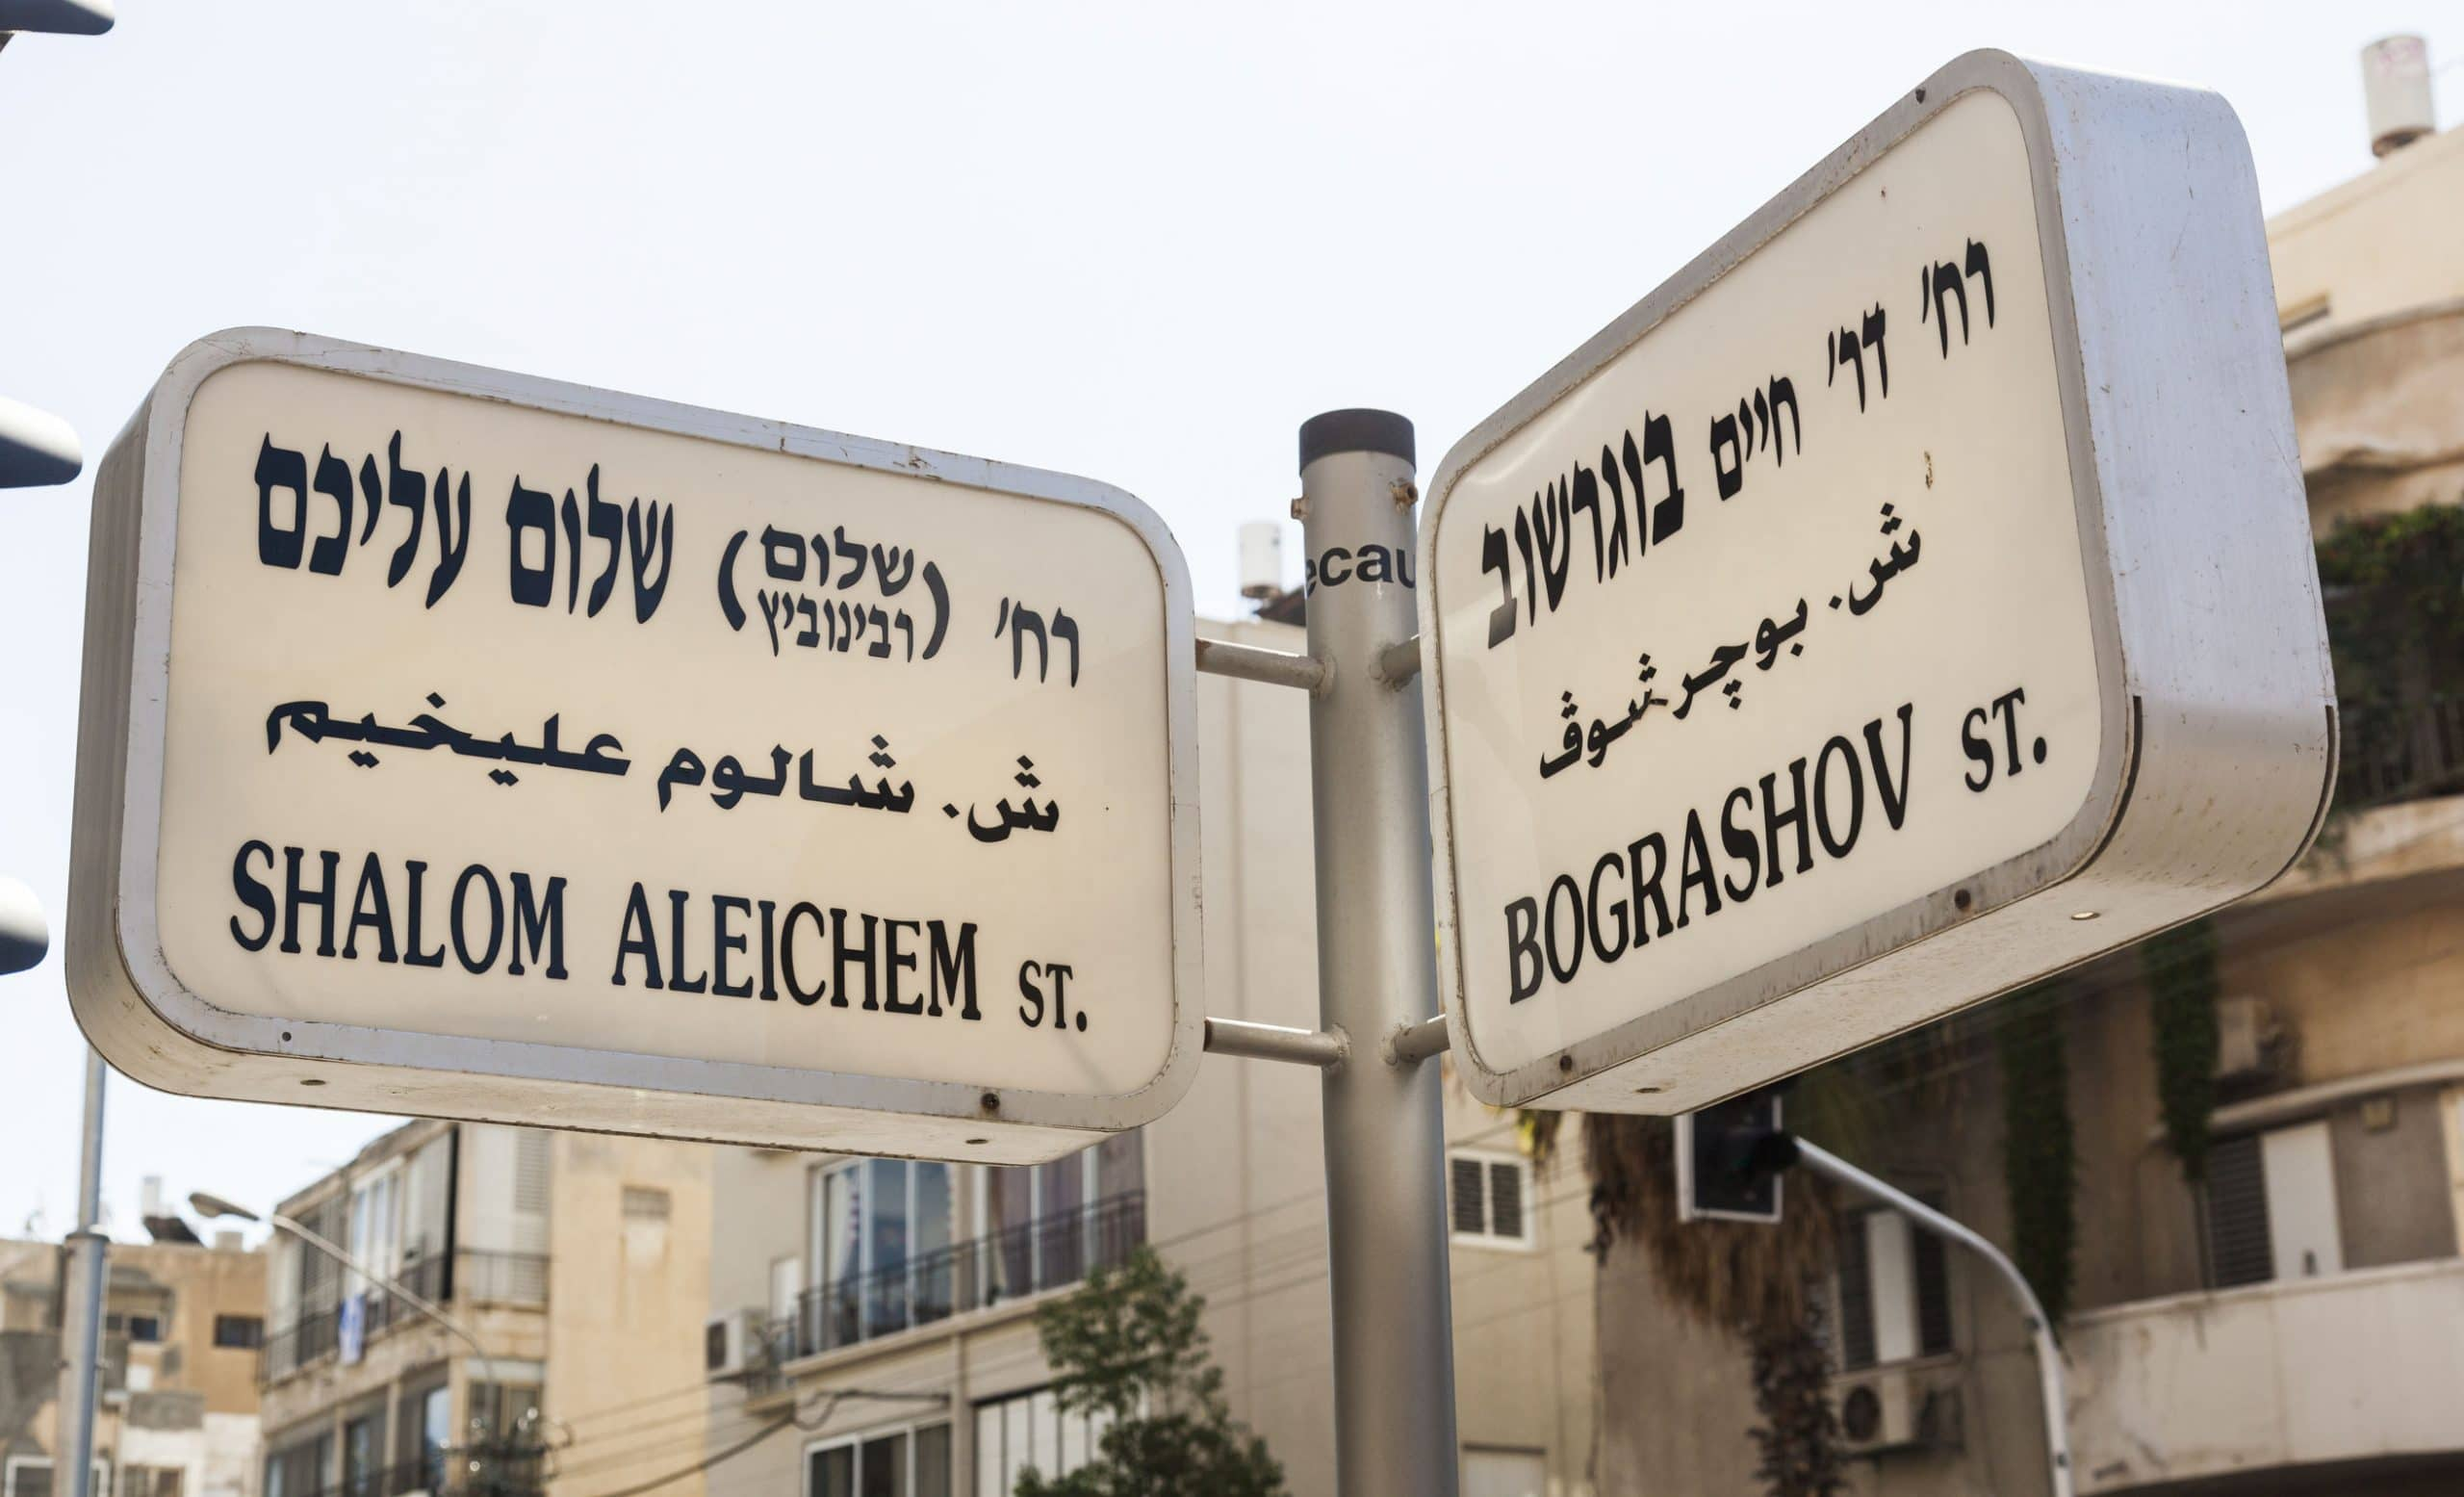 Shalom Aleichem and Bograshov street name signs. Tel Aviv, Israel